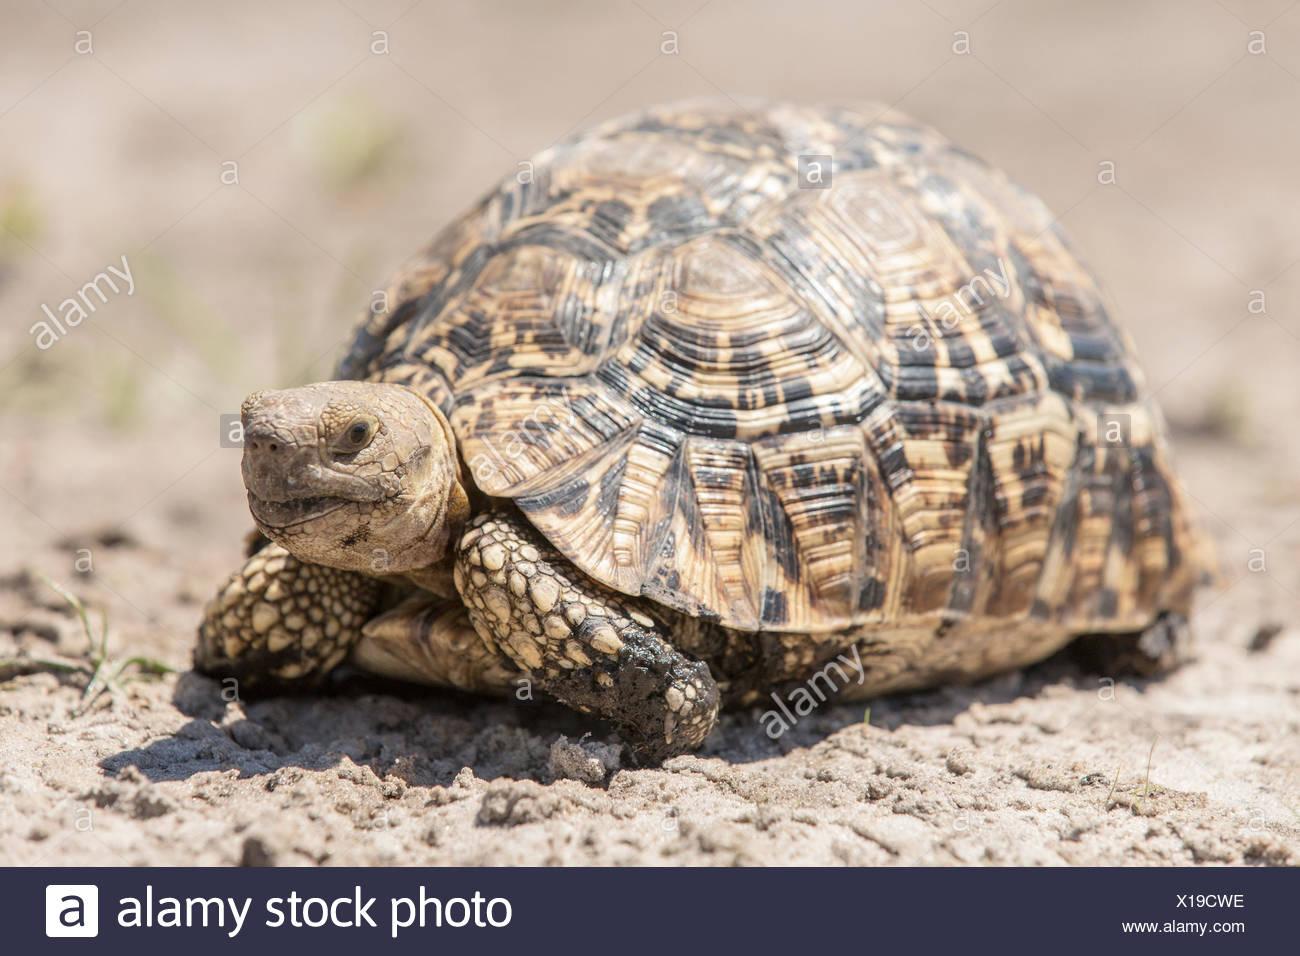 Leopard tortoise (Geochelone pardalis), Mamili National Park, Caprivi Strip, Namibia, Africa Stock Photo